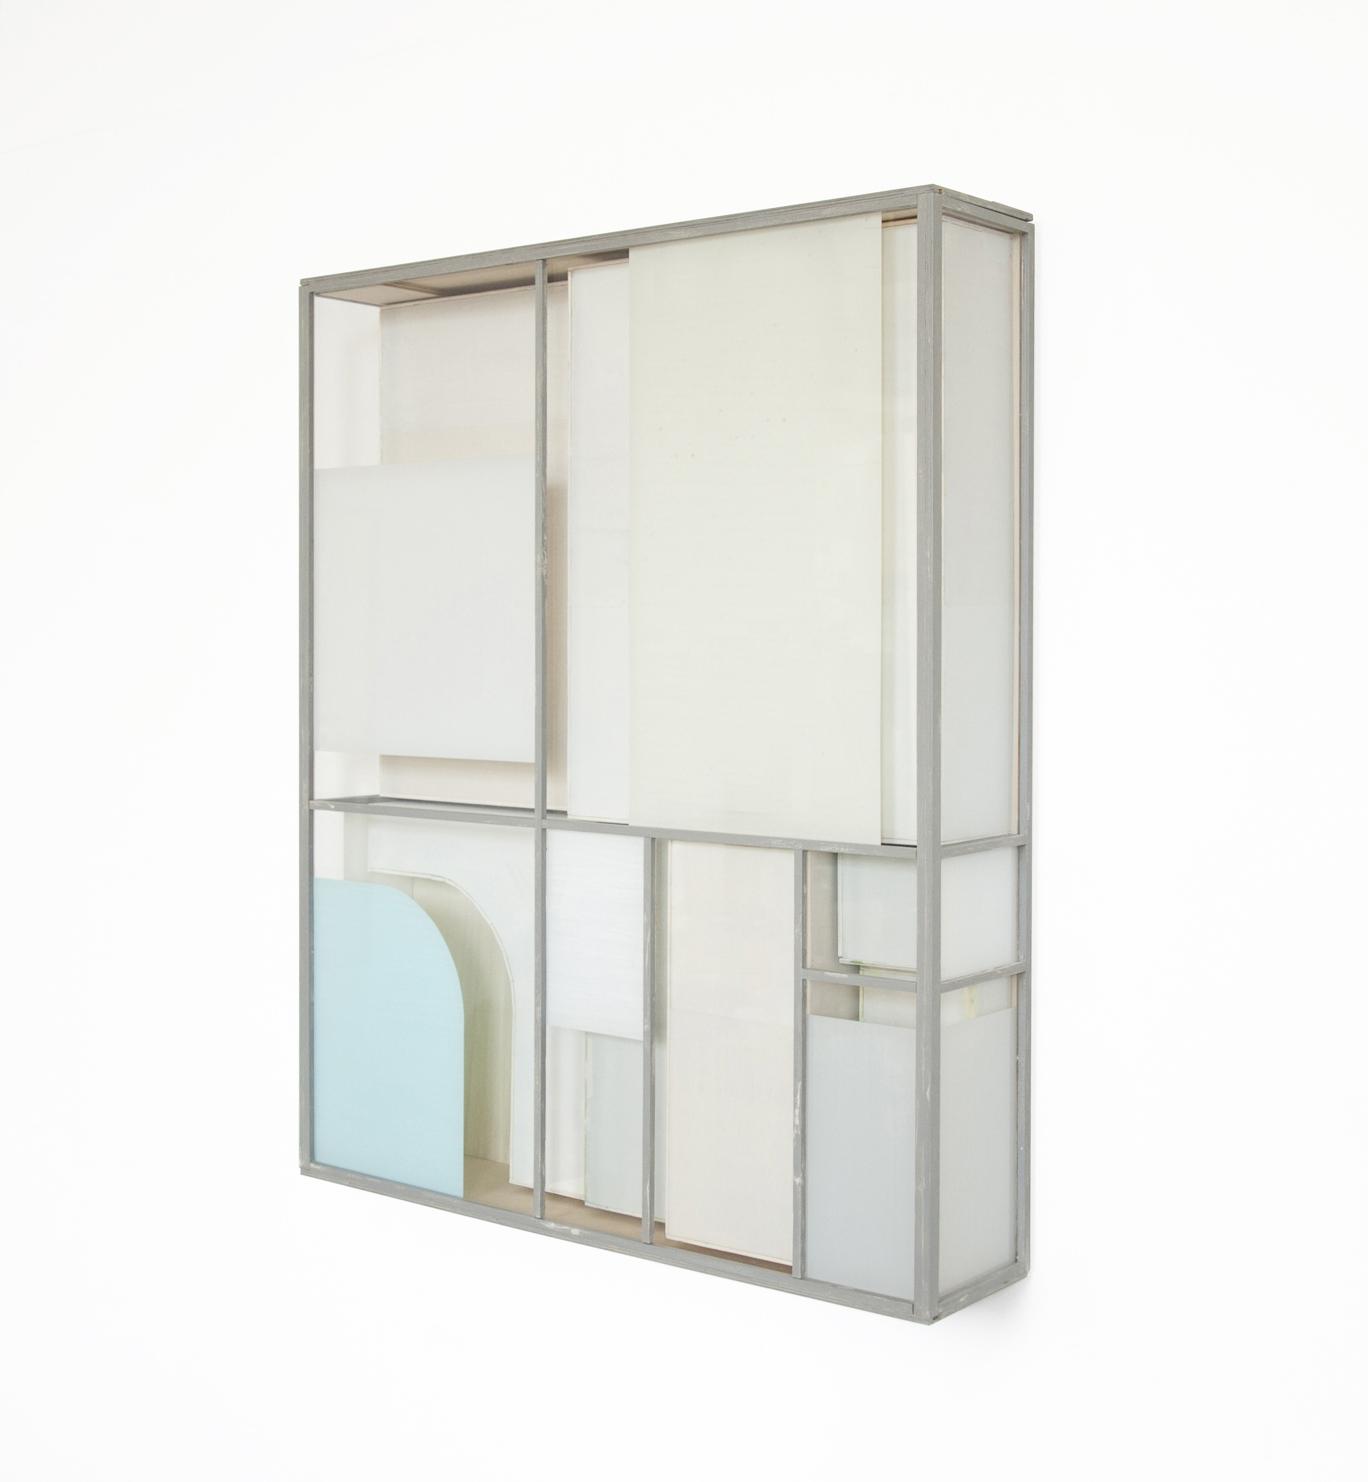 Minimal BL, 2018, Holz, Acrylglas, Farbe, 81 x 67 x 14 cm